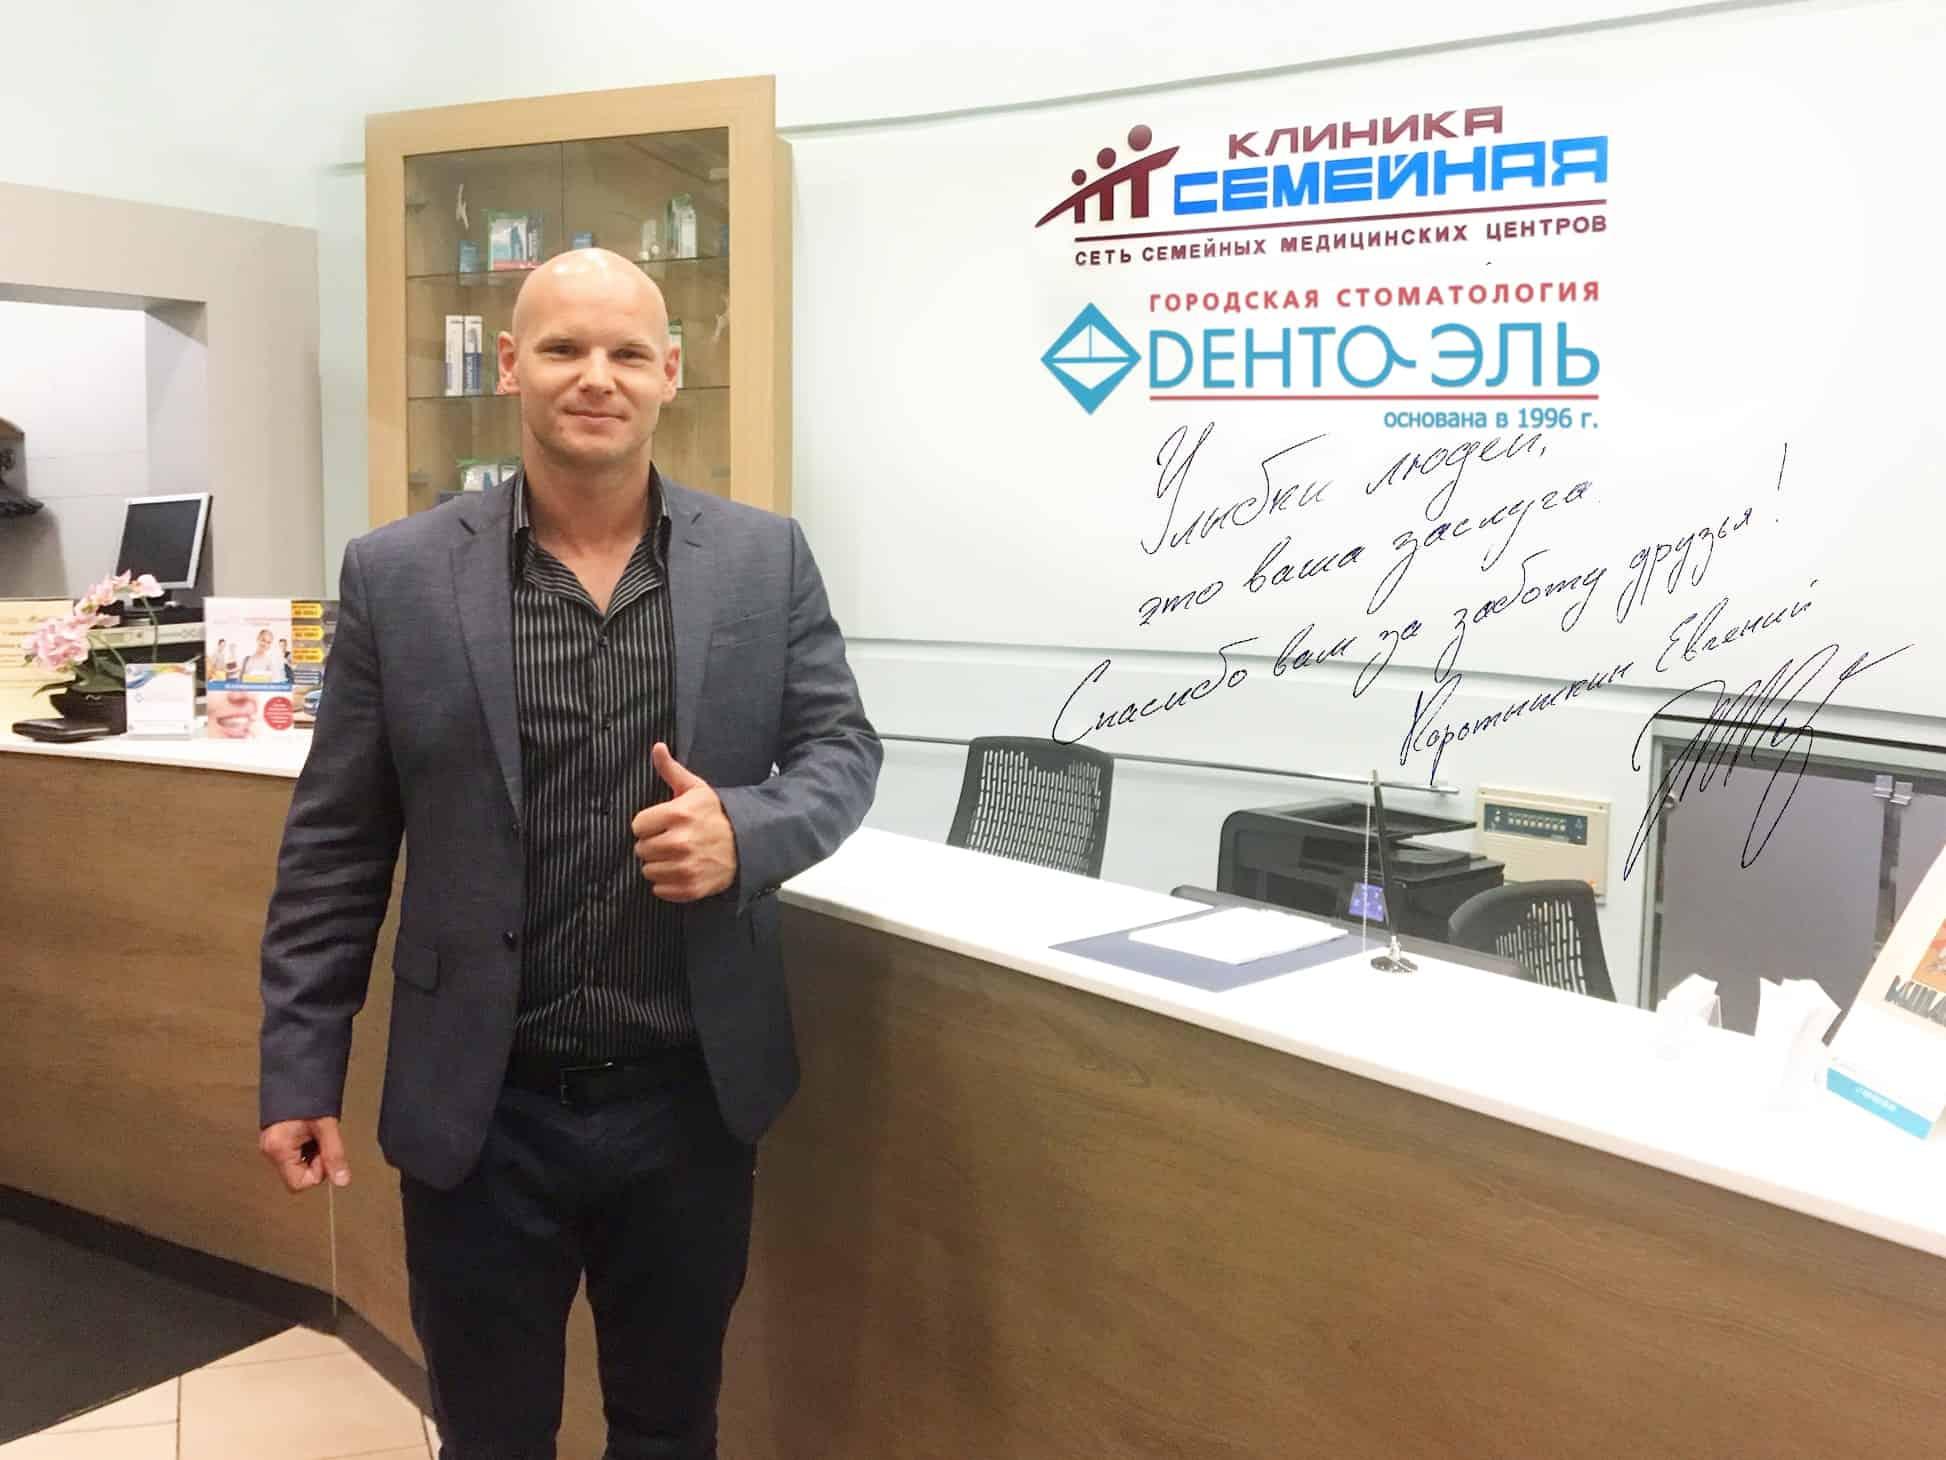 Коротышкин Евгений в Дента-Эль фото